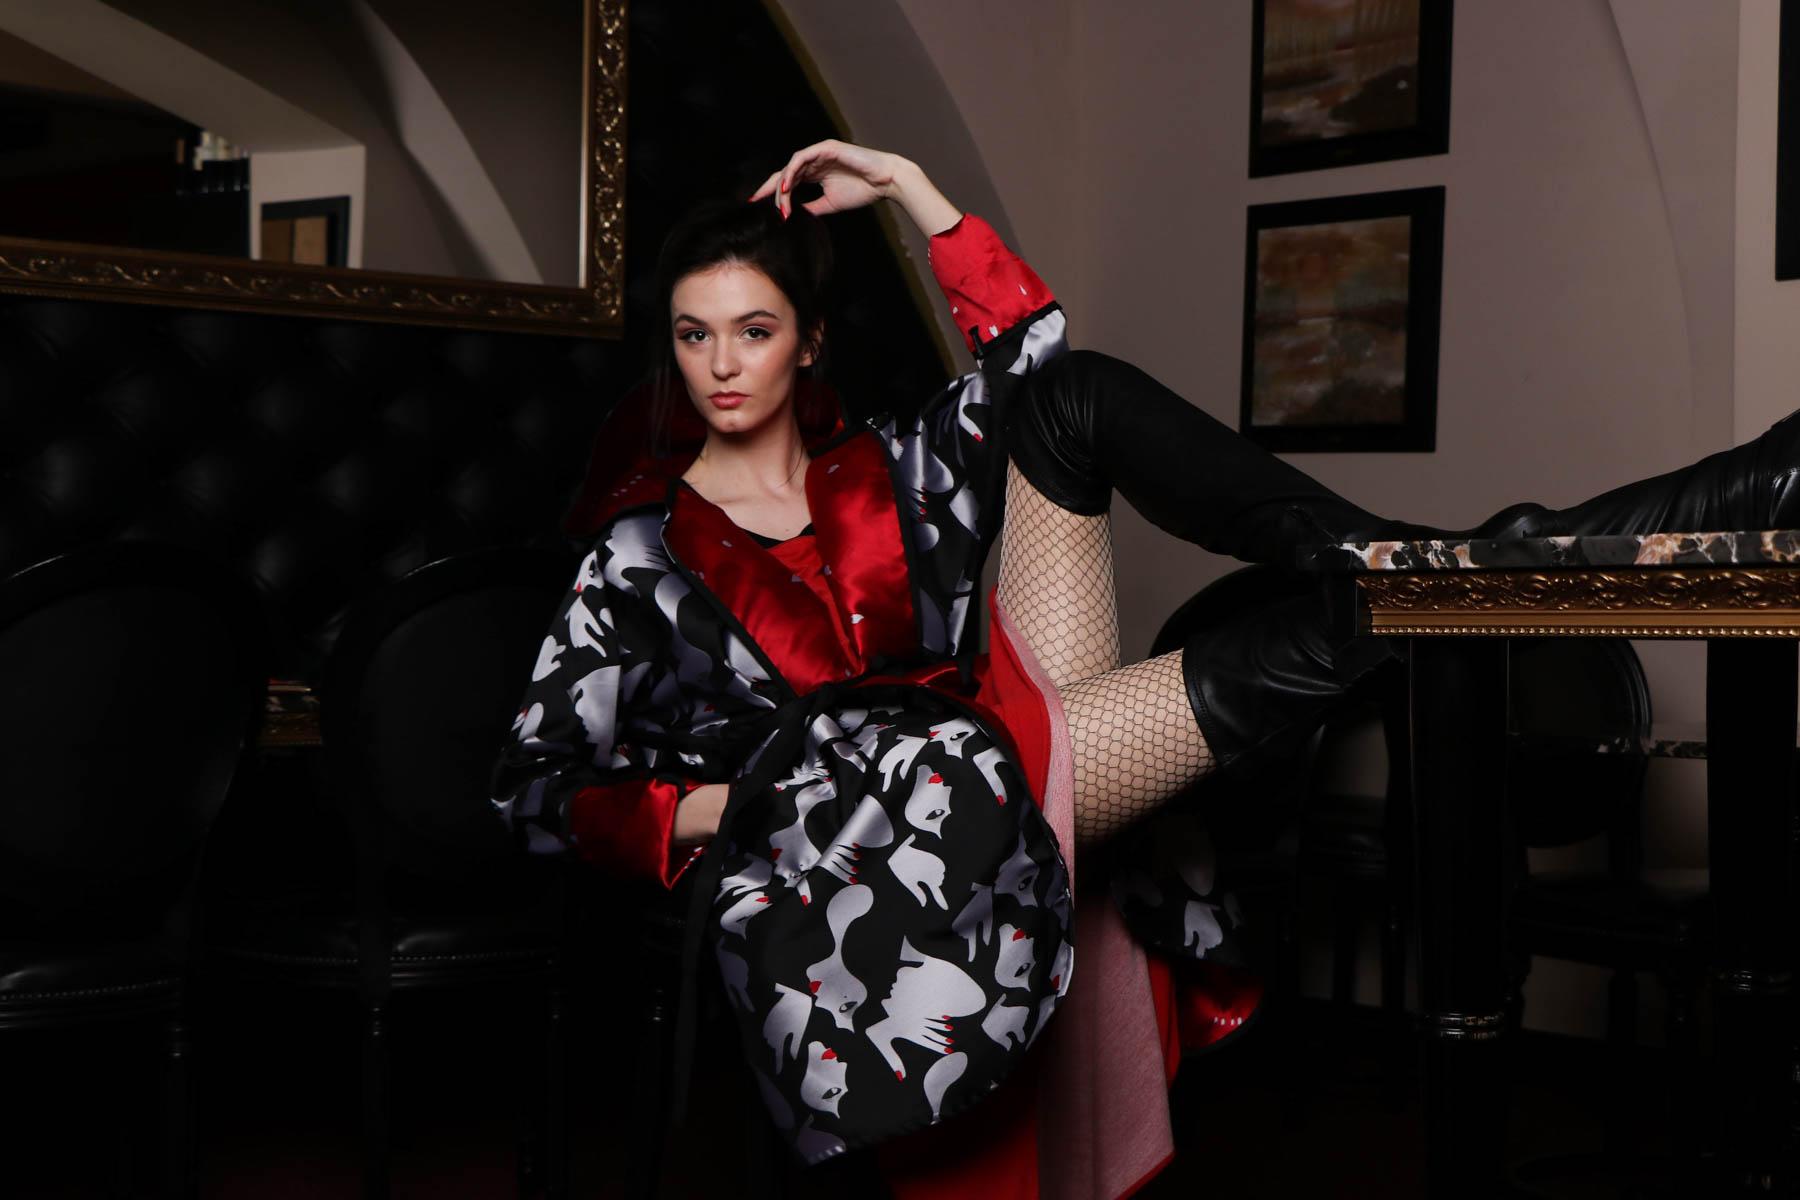 NI / rdeča obleka / 126 eur  Renata Bedene / plašč rdeč 165 eur